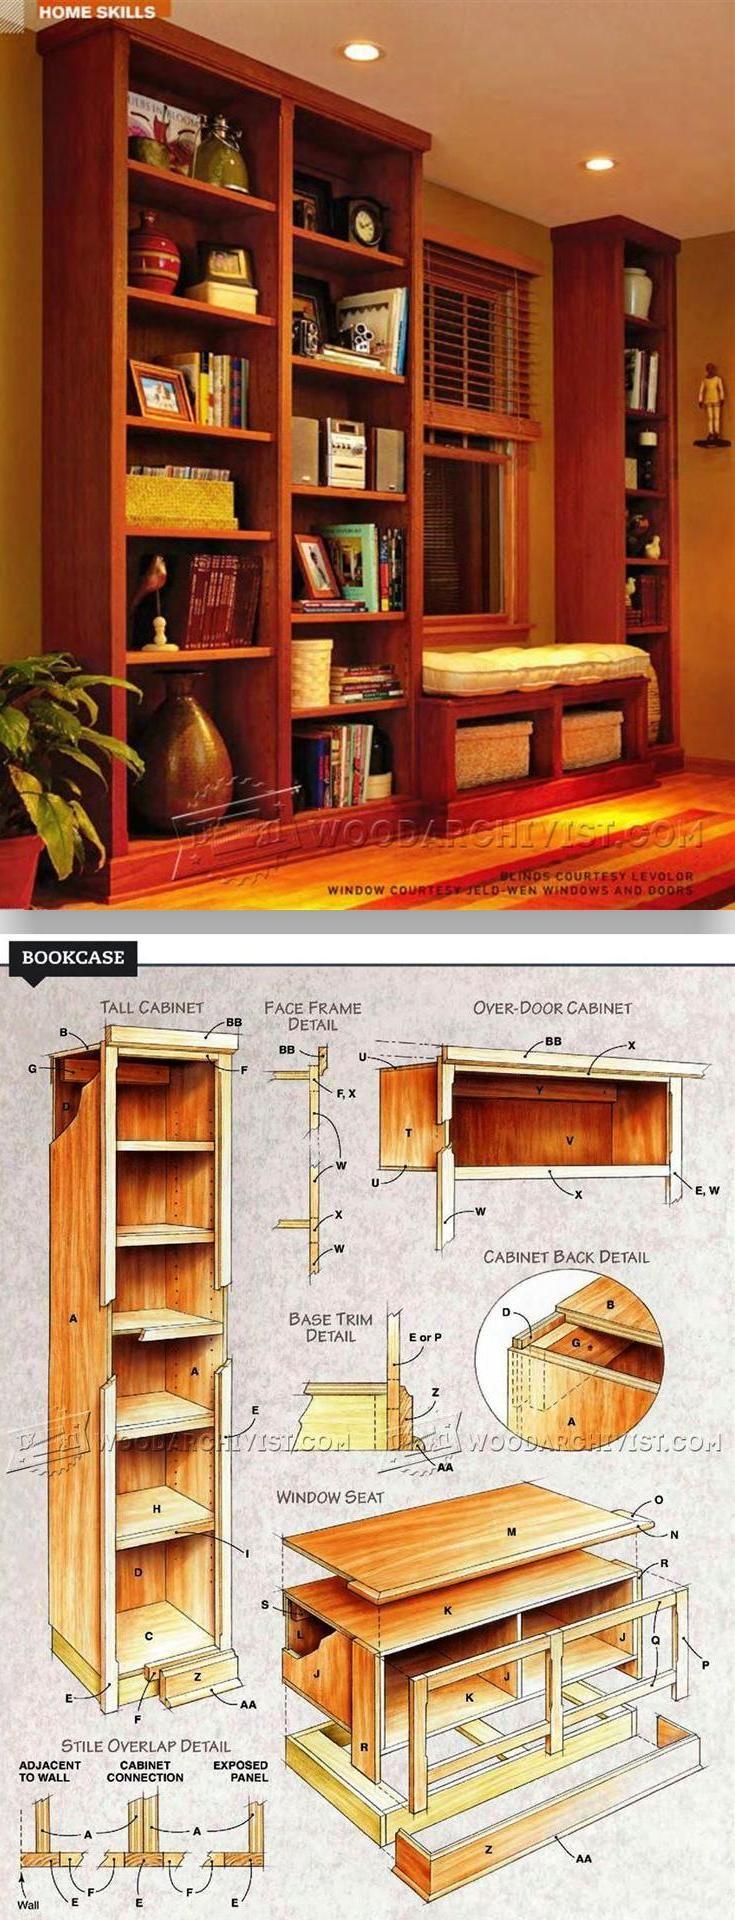 Best 20+ Bookcase plans ideas on Pinterest | Build a bookcase ...